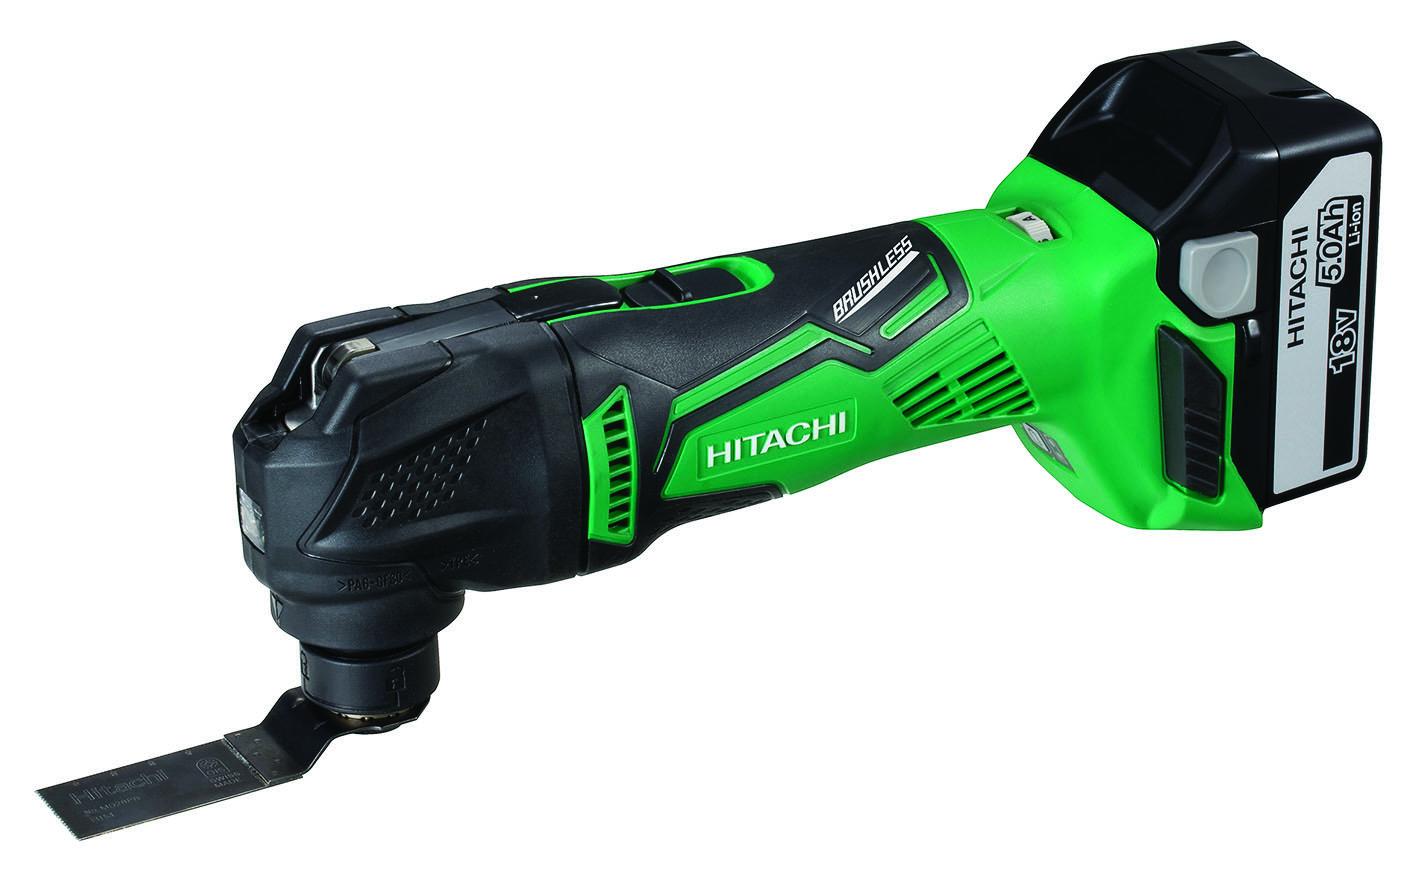 Hitachi launches brushless 18V Multi Tool